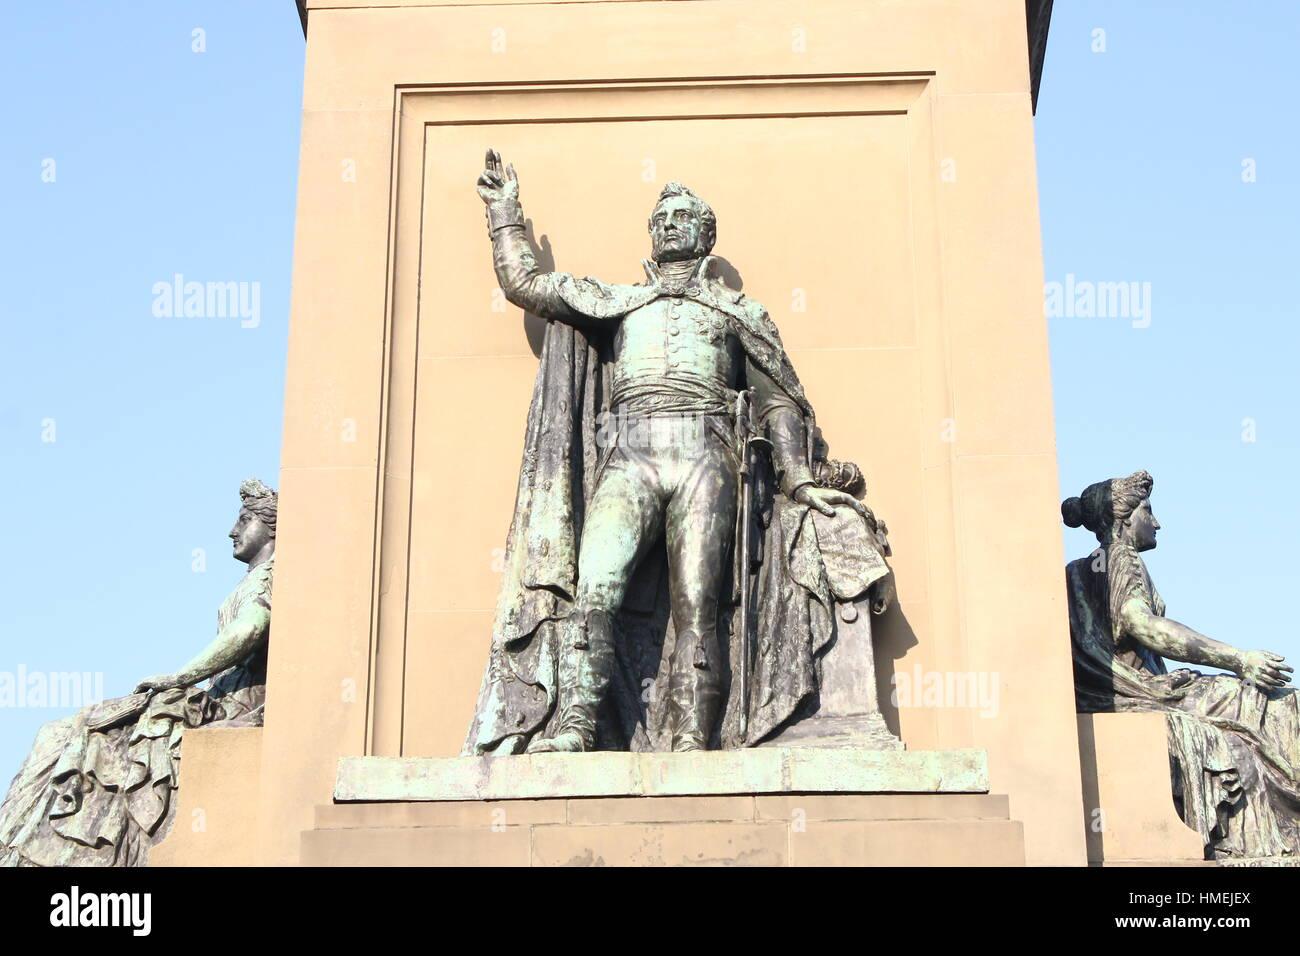 Siglo xix independencia monumento (Onafhankelijkheidsmonument) en plein 1813, Den Haag, Países Bajos. El rey Imagen De Stock